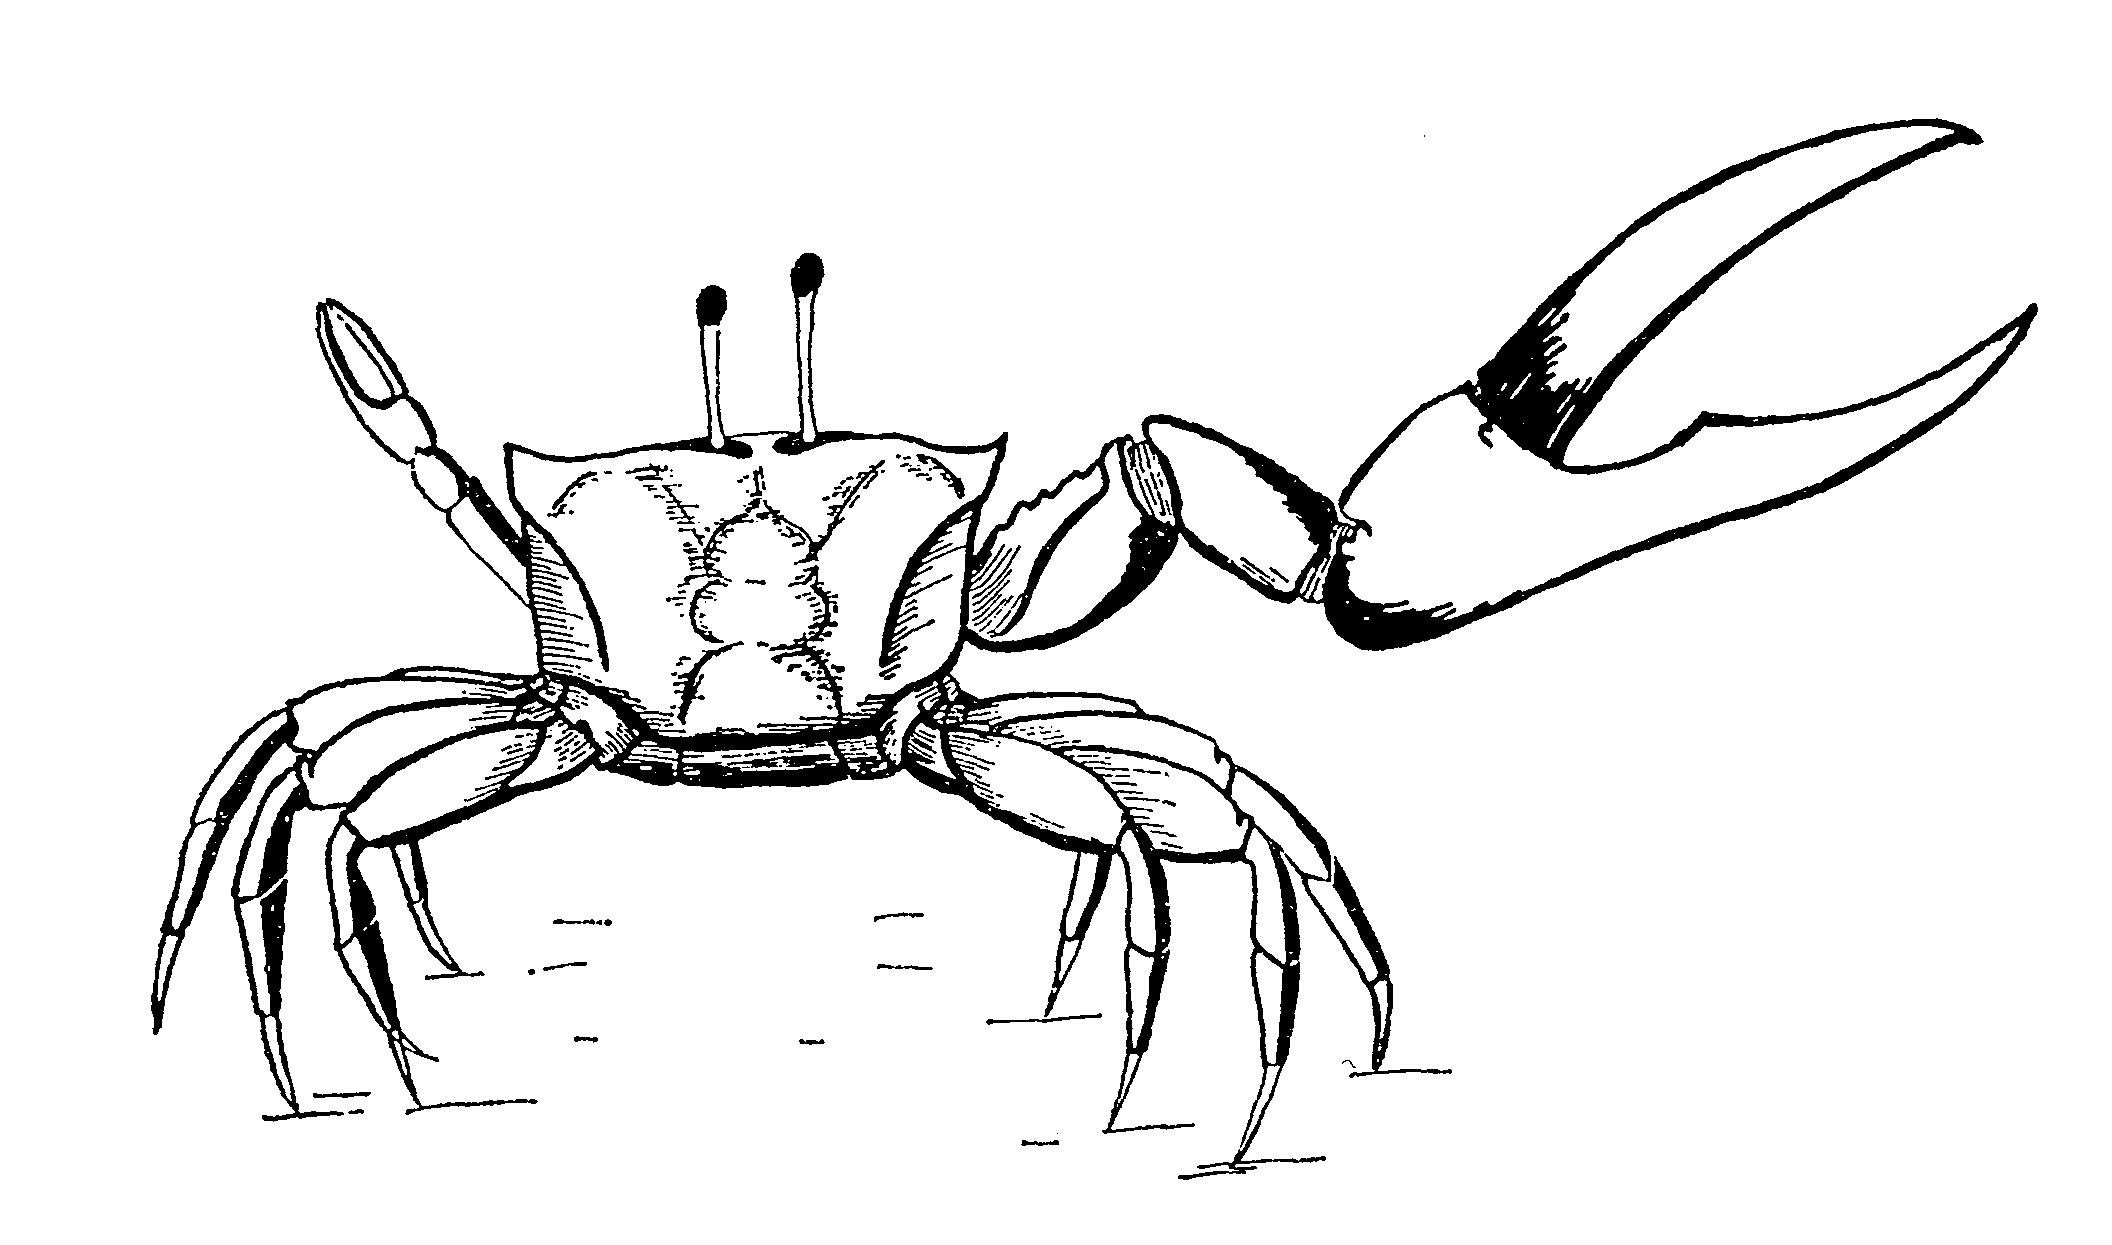 Fiddler Crab Drawing Position in Fiddler Crabs